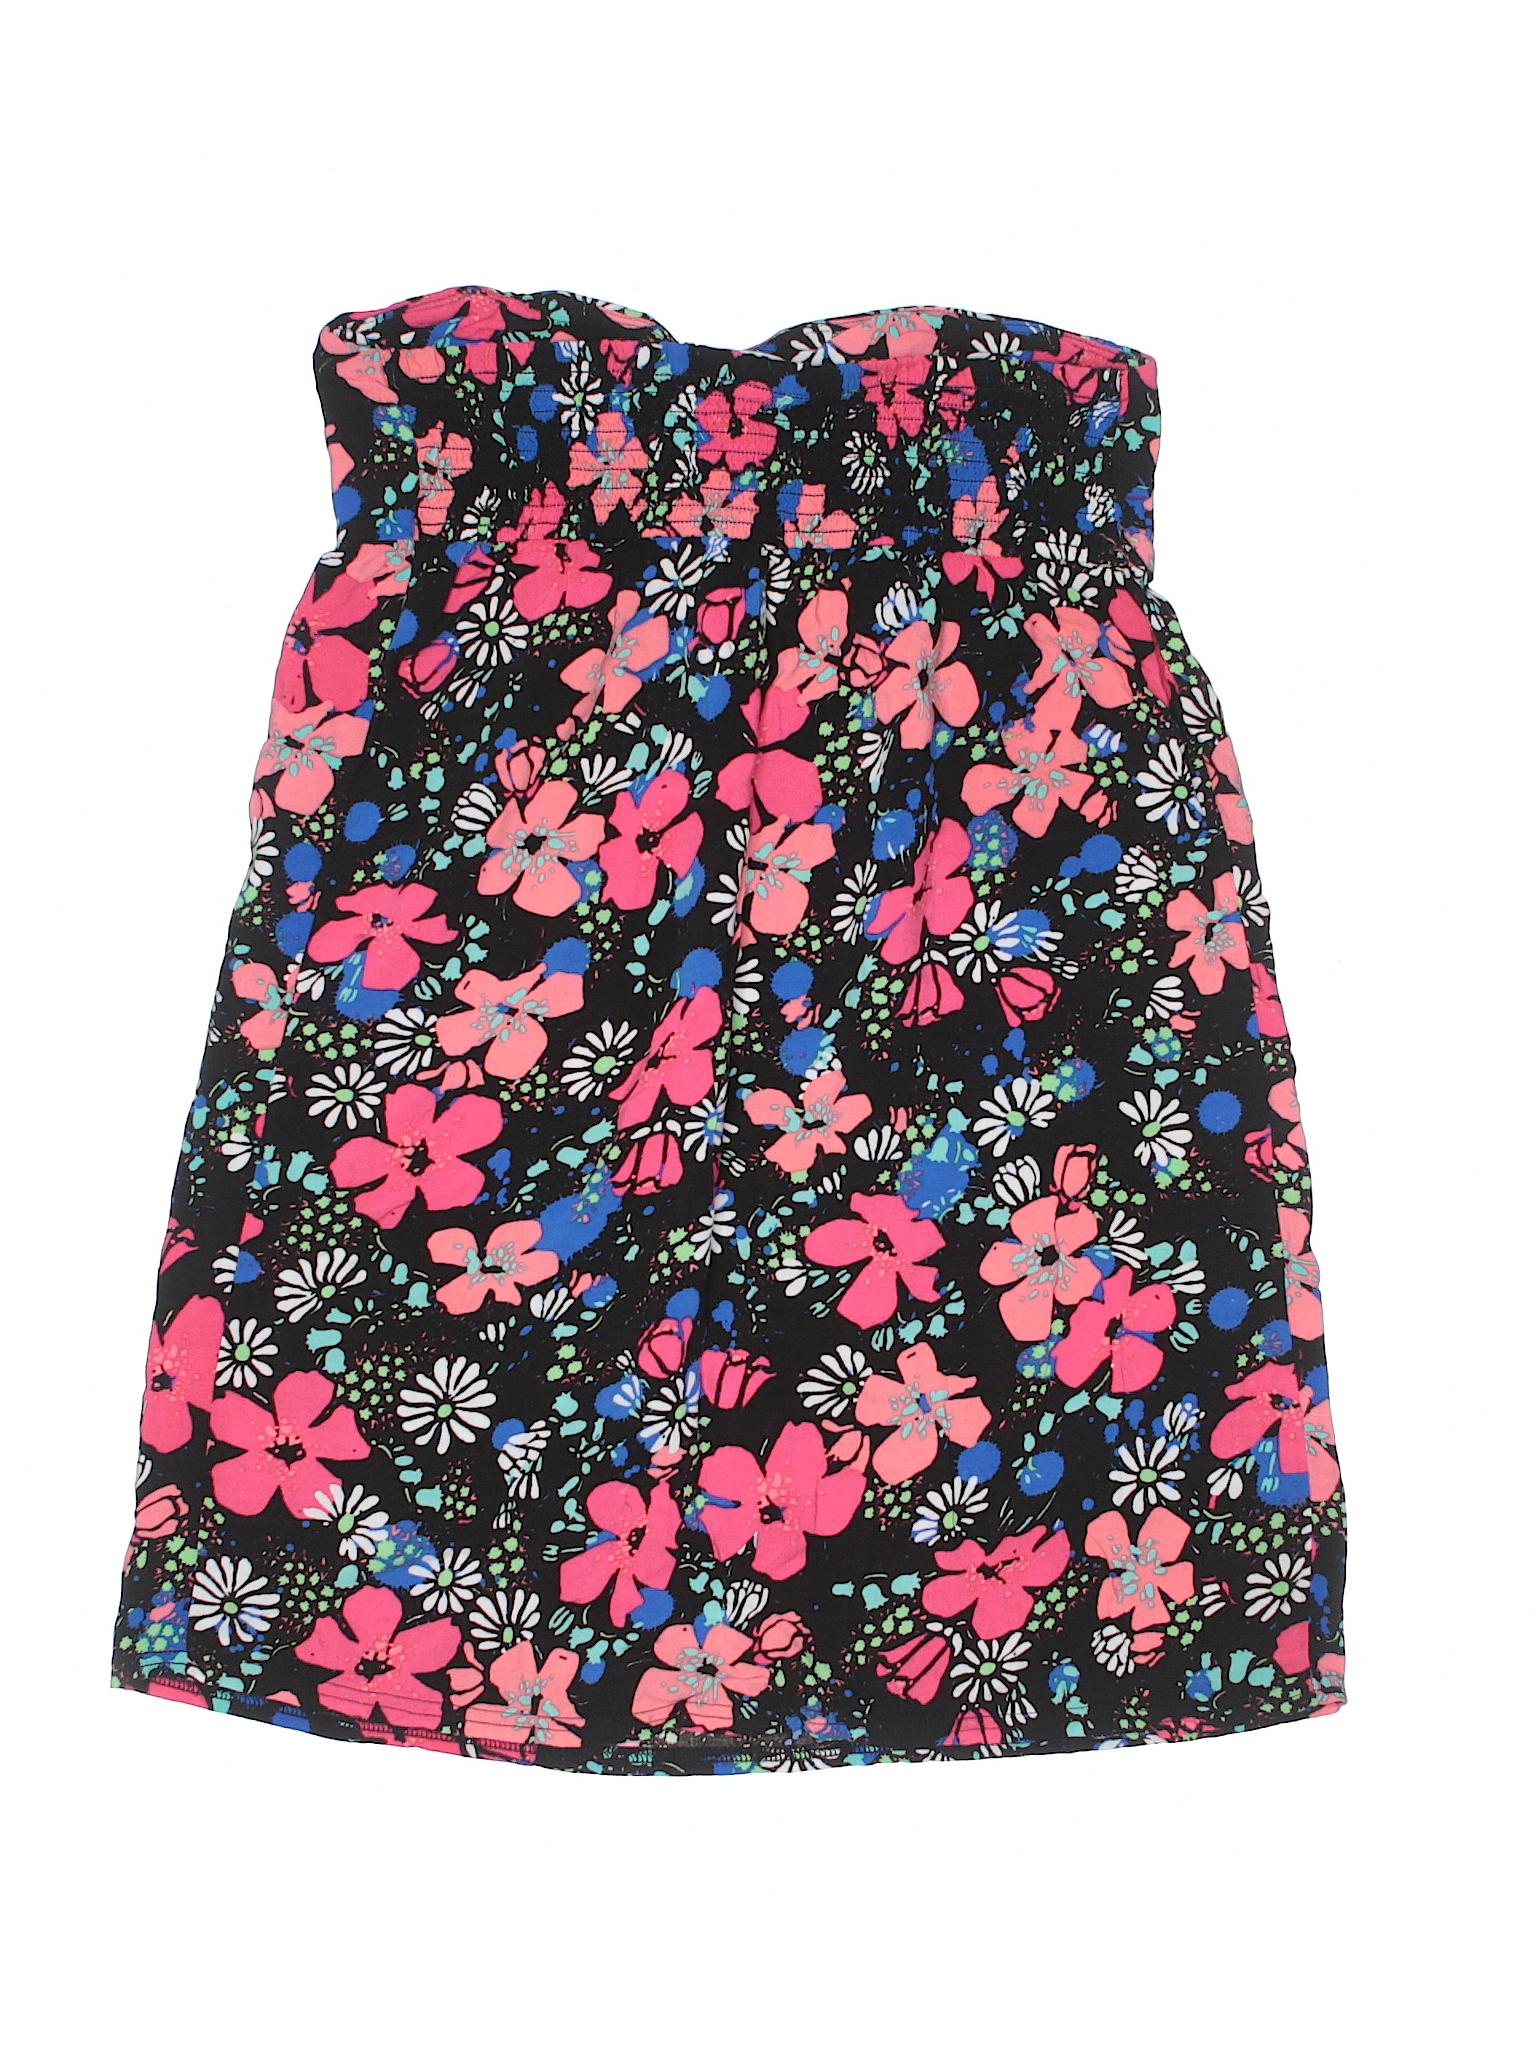 Boutique Swimsuit Cover Boutique Xhilaration Xhilaration Up g86W5aPqU